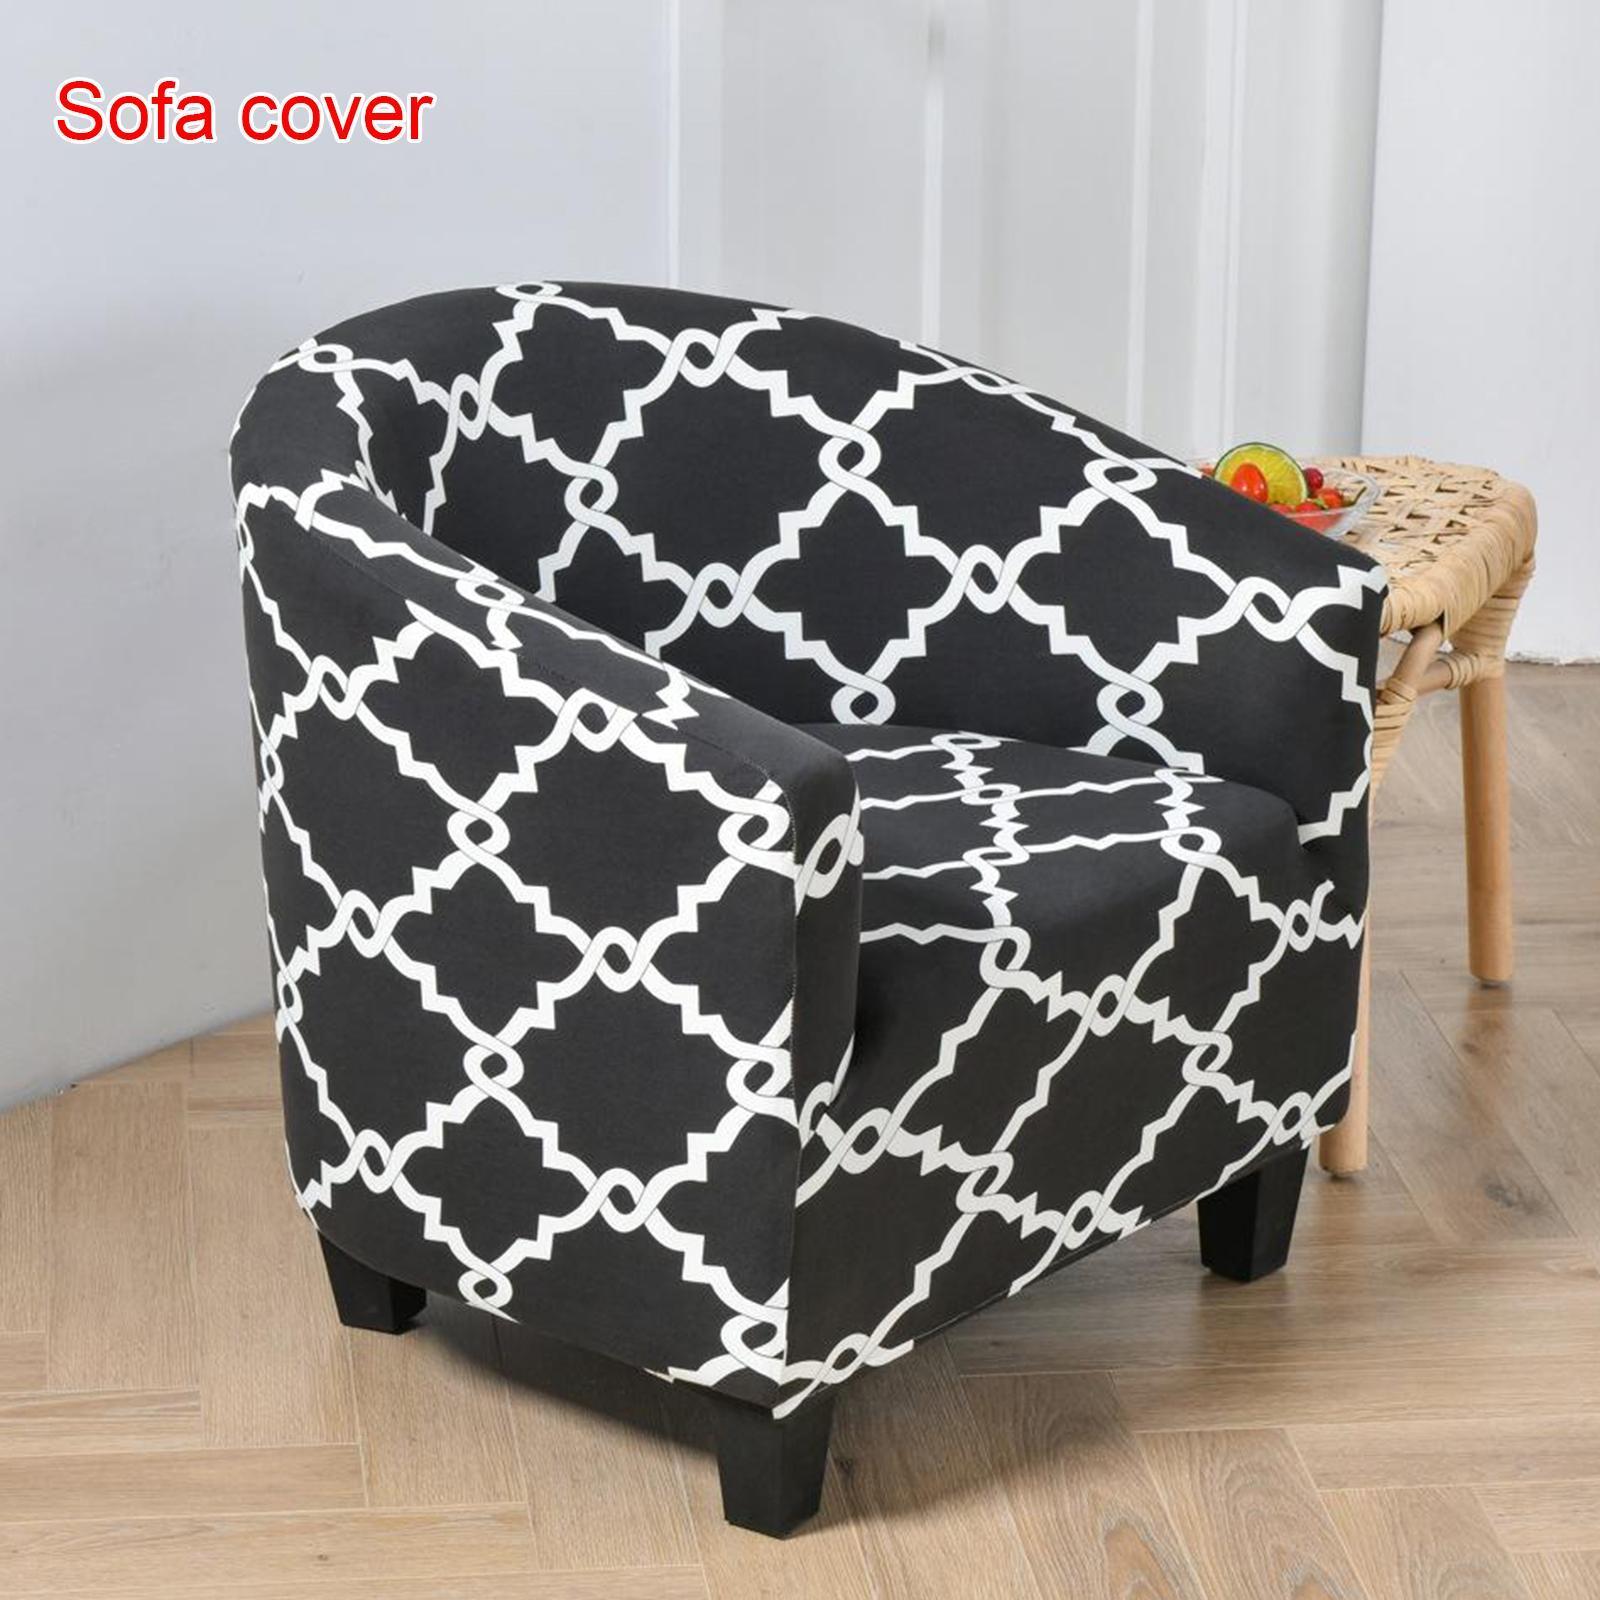 miniatura 15 - Fodera per poltrona singola per poltrona Fodera per sedia in colori assortiti